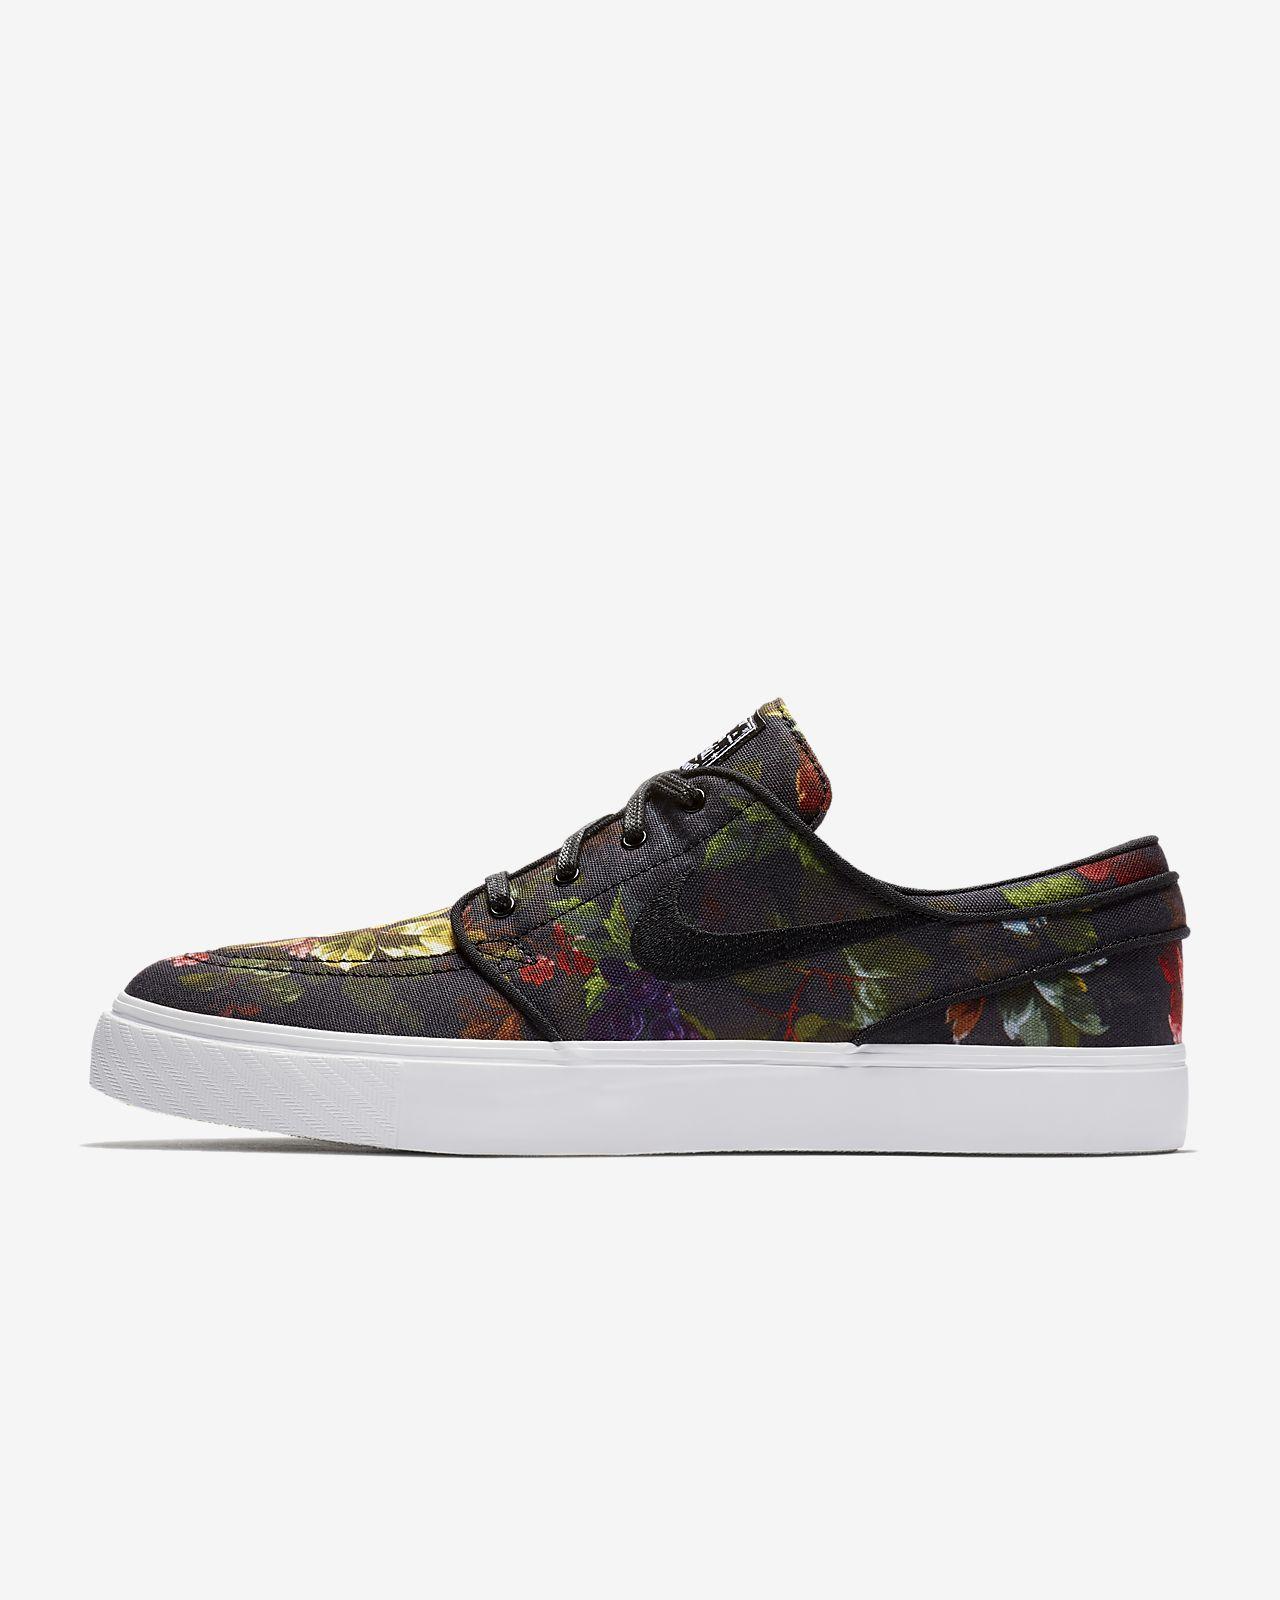 free shipping eda54 9f84a ... low price nike sb zoom stefan janoski canvas mens skateboarding shoe  fea11 7f420